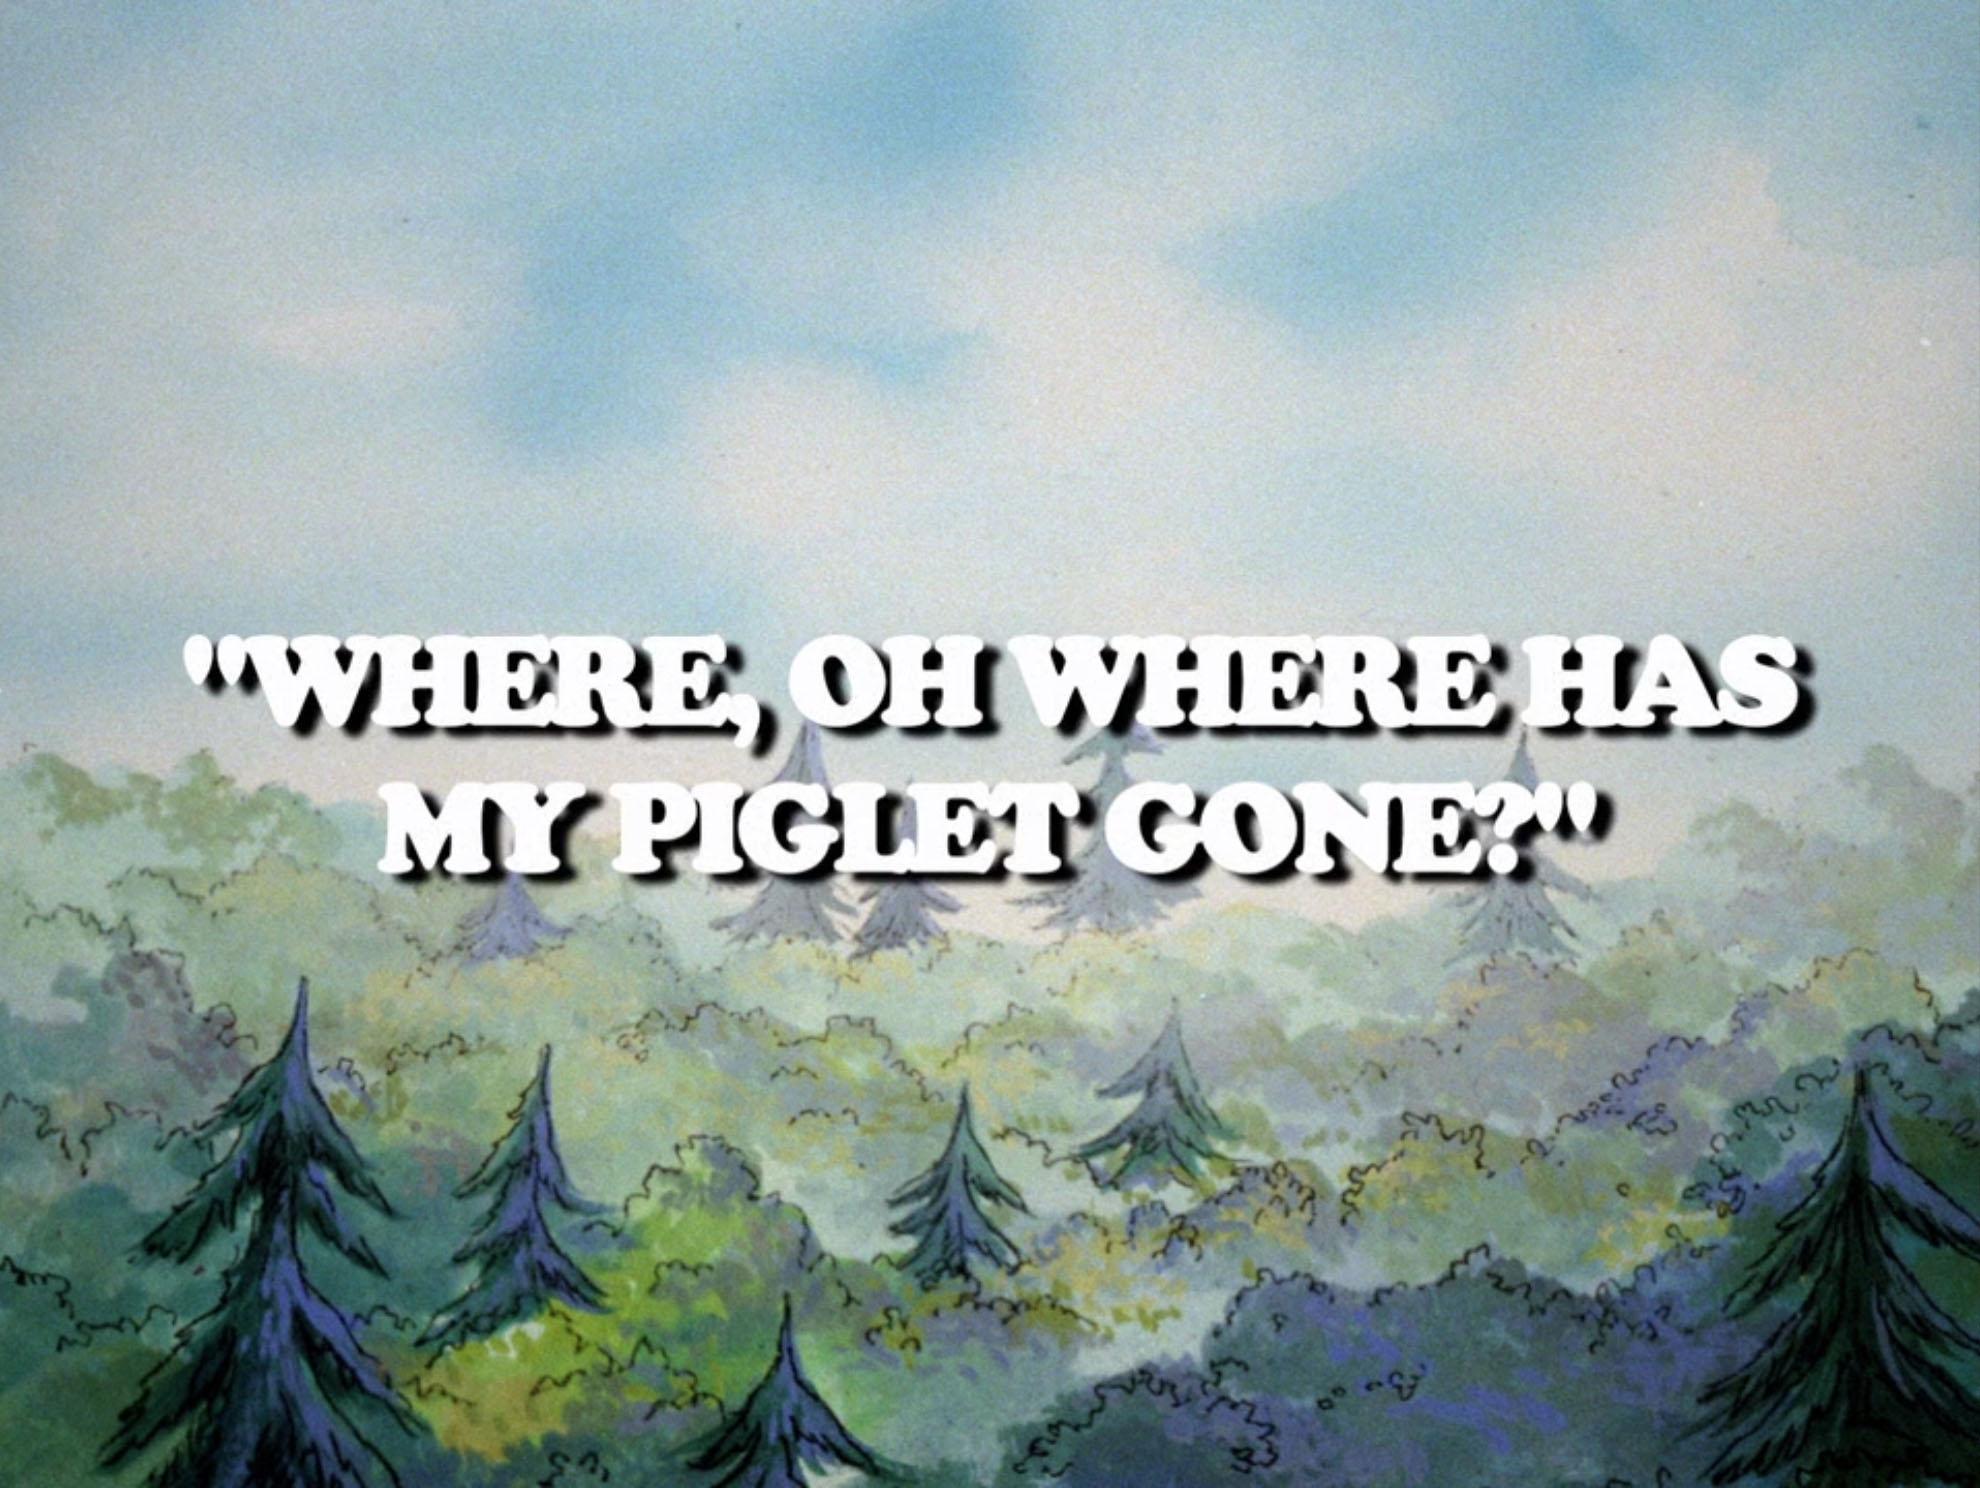 File:Whereohwherehasmypigletgone.jpg